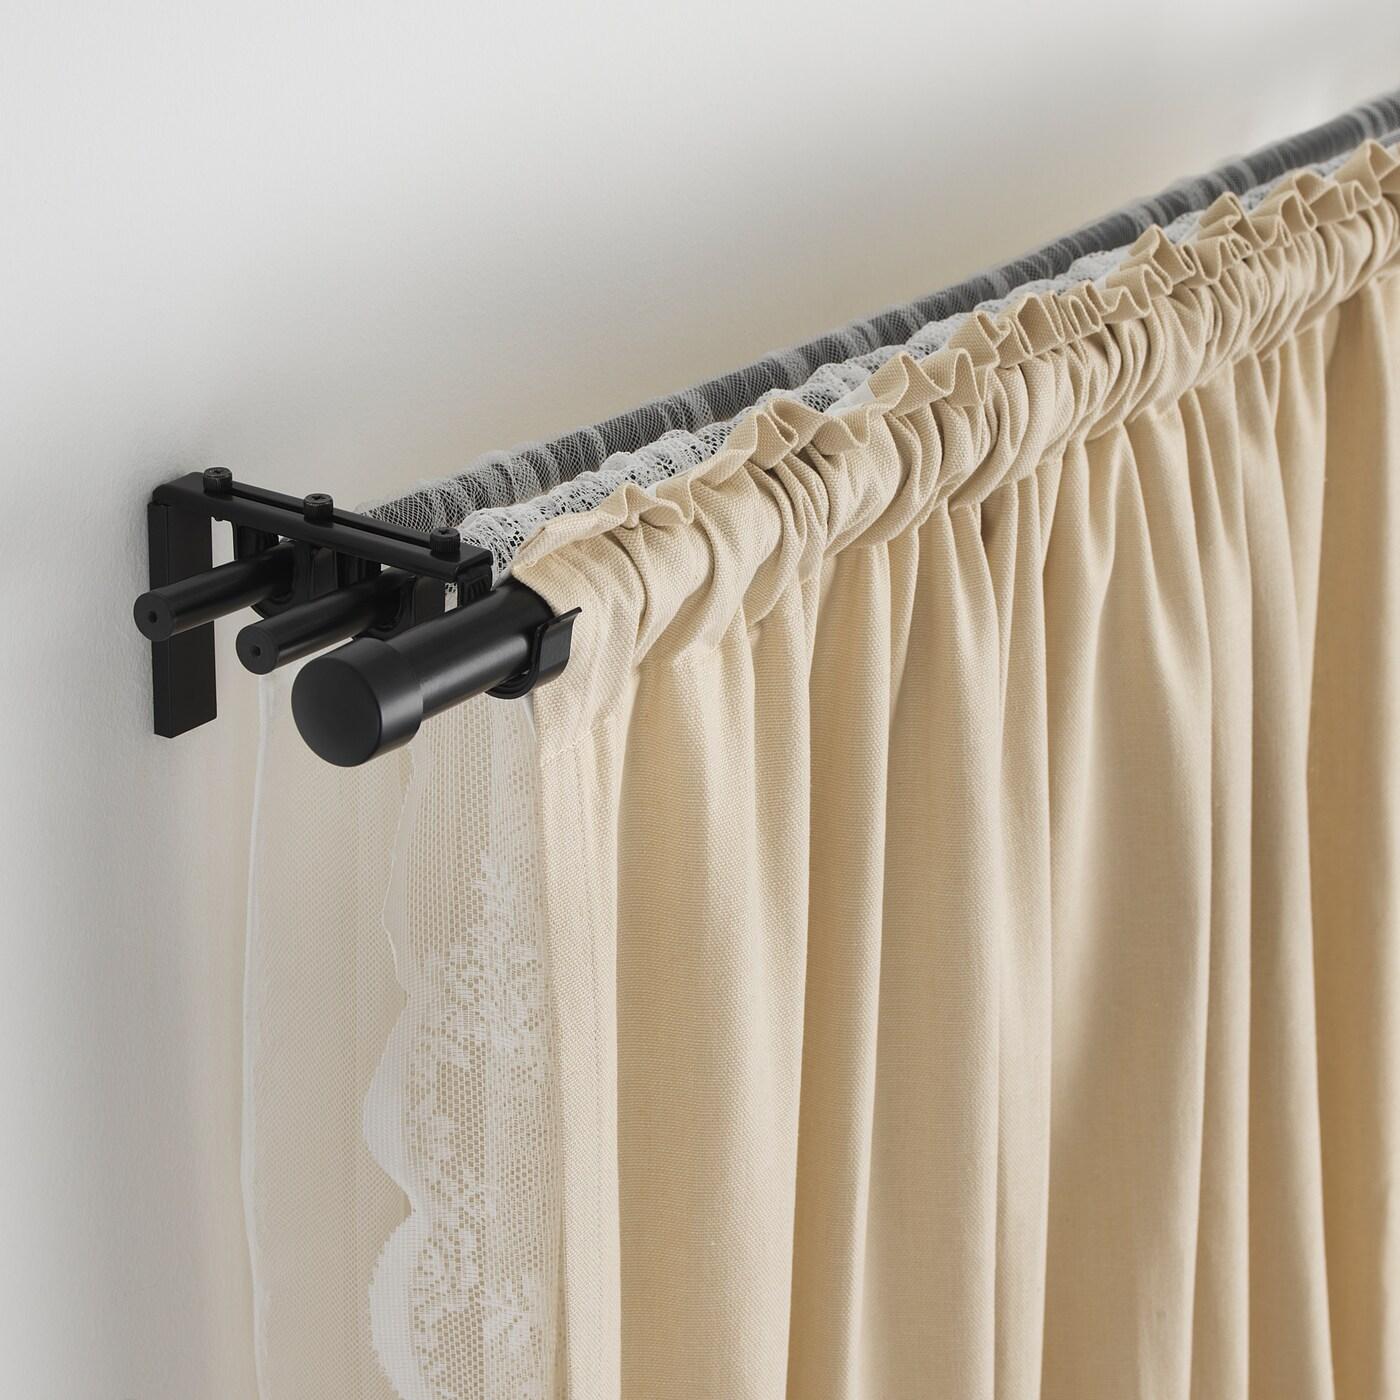 racka hugad triple curtain rod combination black 82 5 8 151 5 8